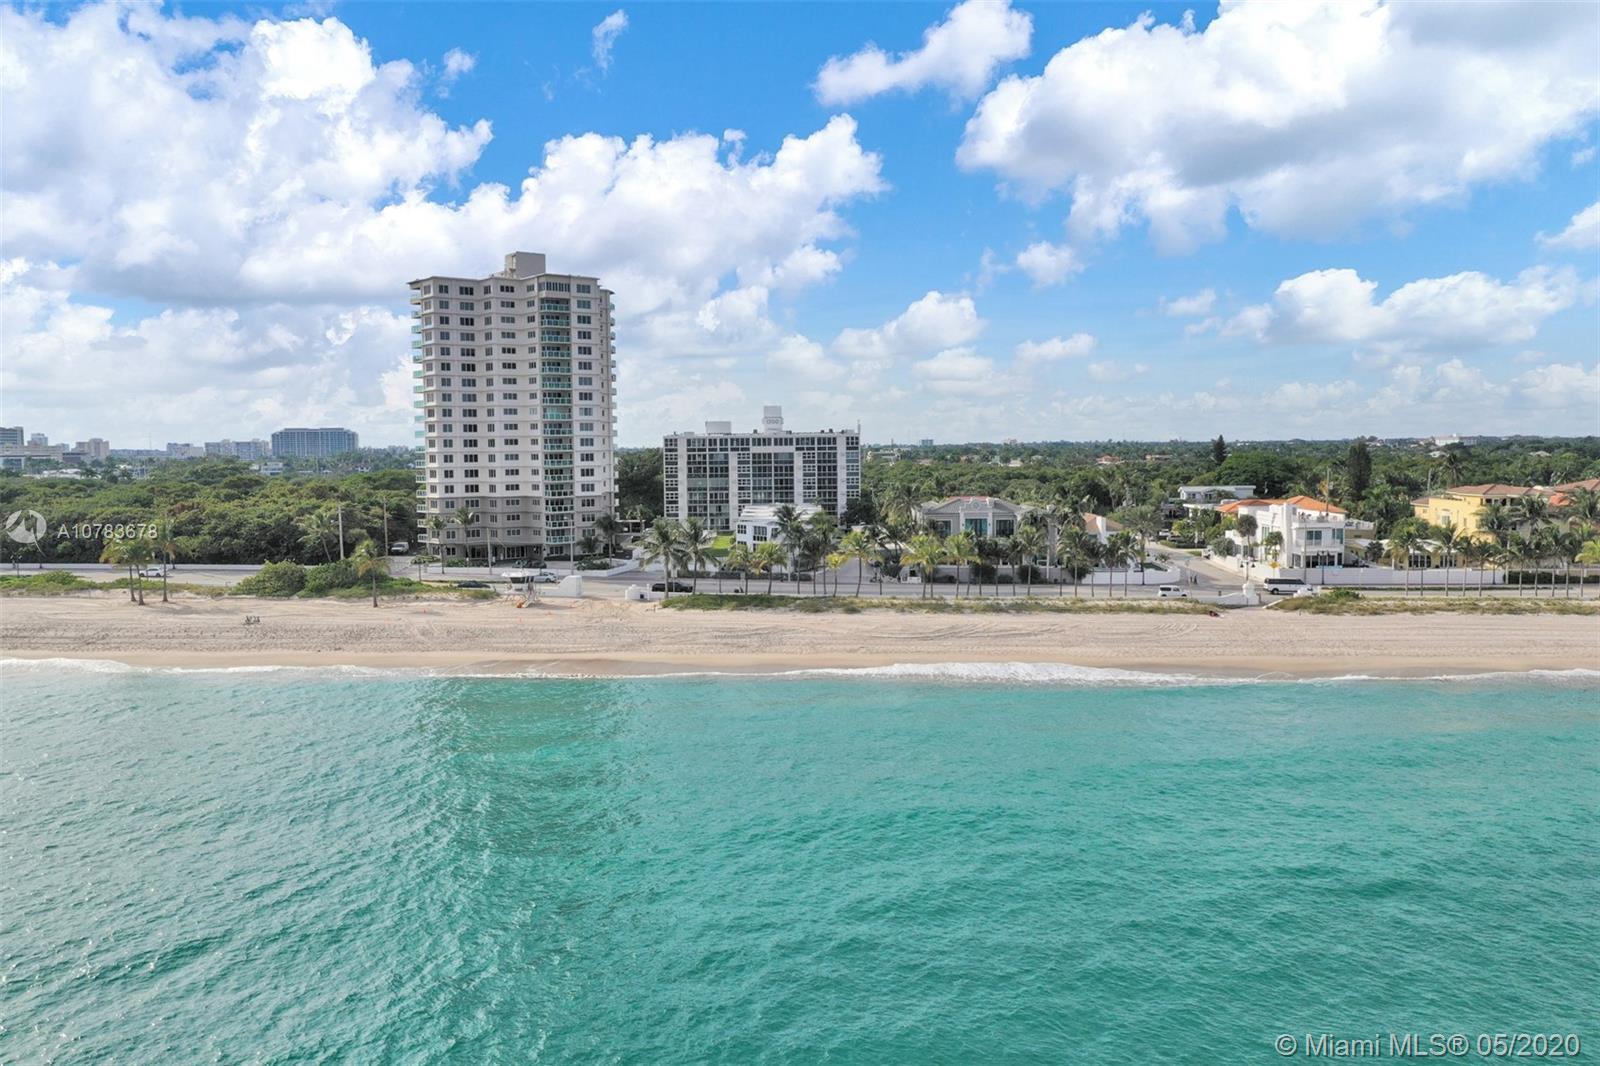 1200 N Fort Lauderdale Beach Blvd 202, Fort Lauderdale, FL 33304